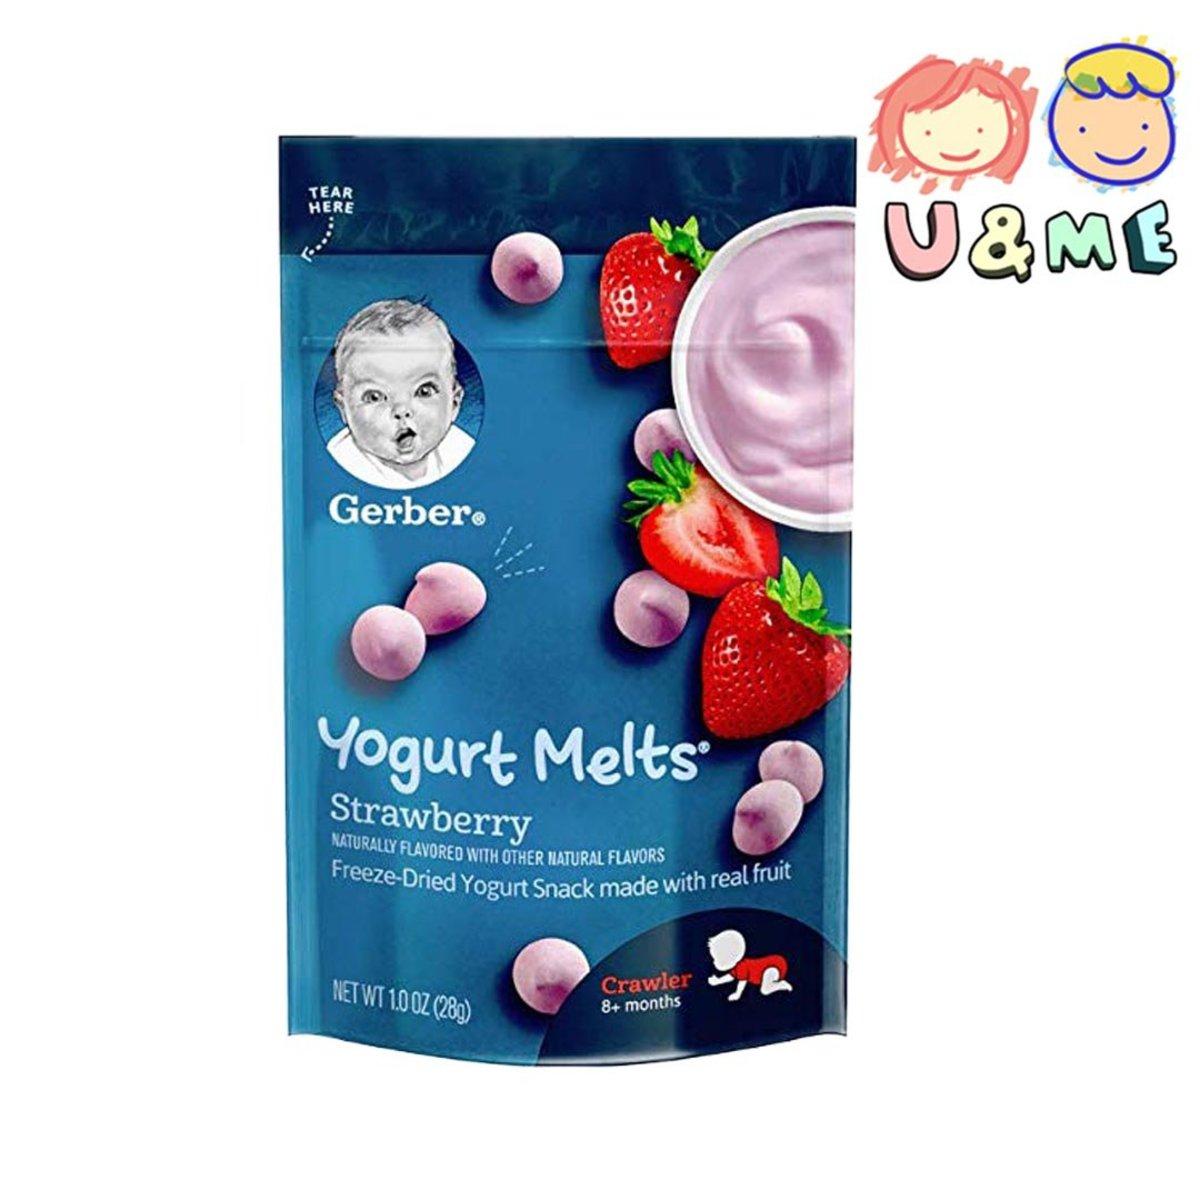 Yogurt Melts -Strawberry 28g (Parallel Import)